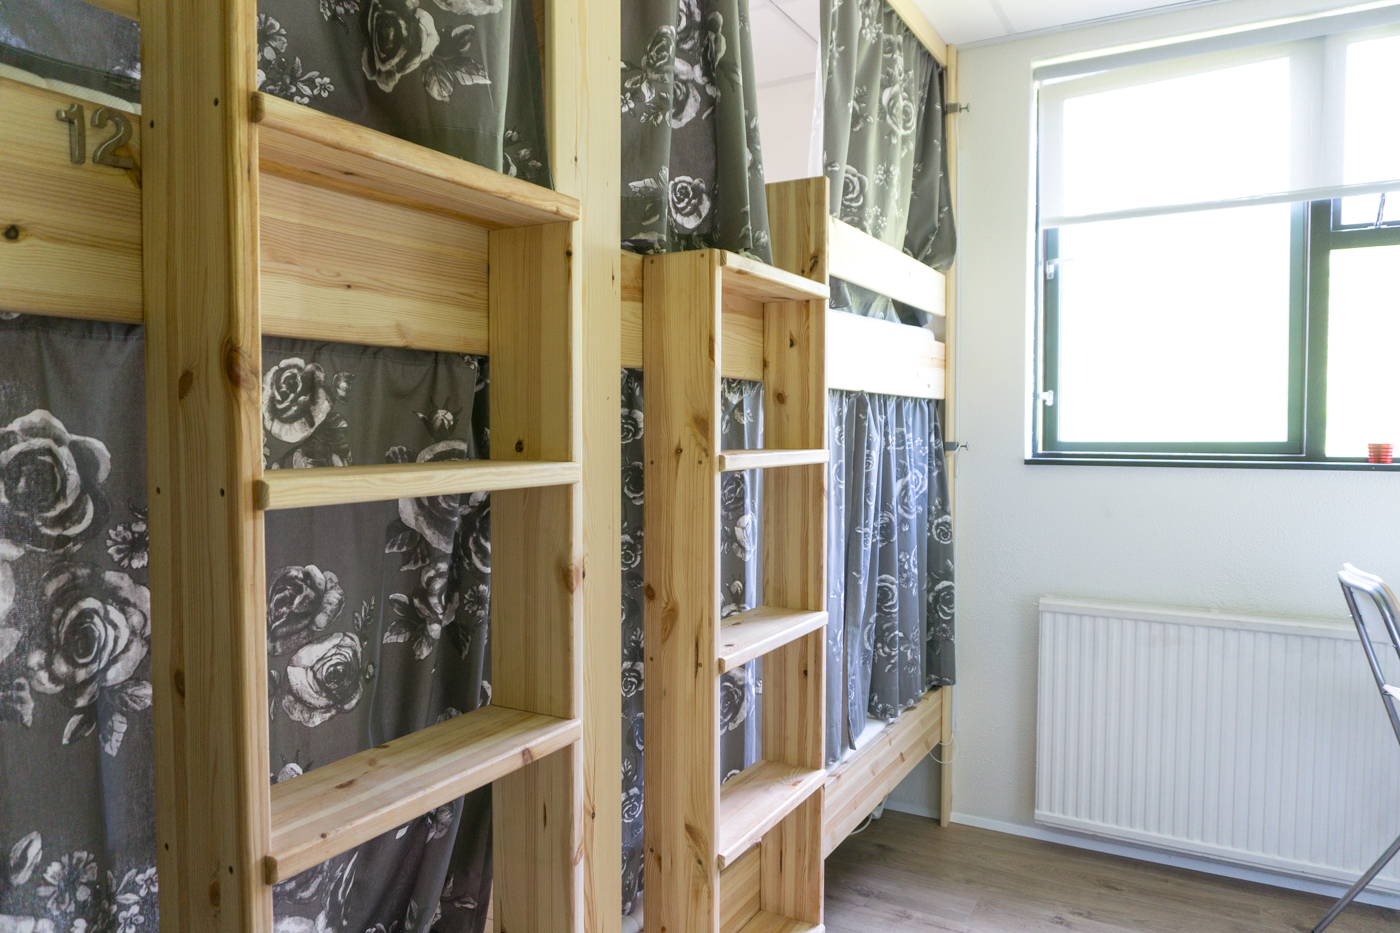 Iceland Visit Hostel - Auberge de jeunesse - Où dormir en Islande?